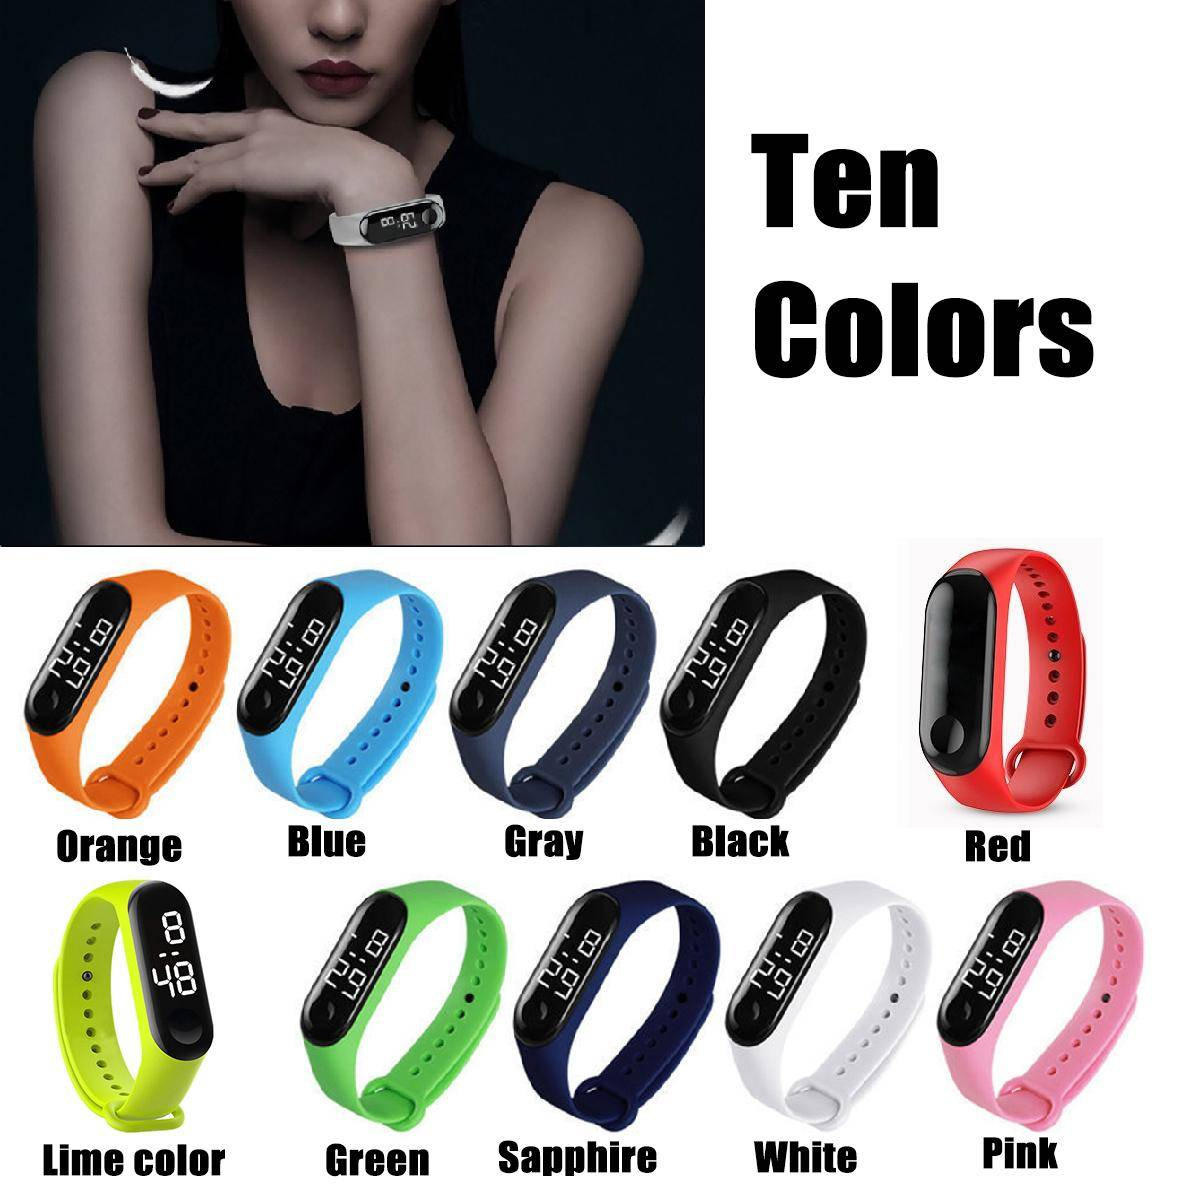 LED Wristband Bracelet Watch - Sports Watch Colourful Fashion Band - Digital Touch Watch band -  Fine Quality & Fashionable Design